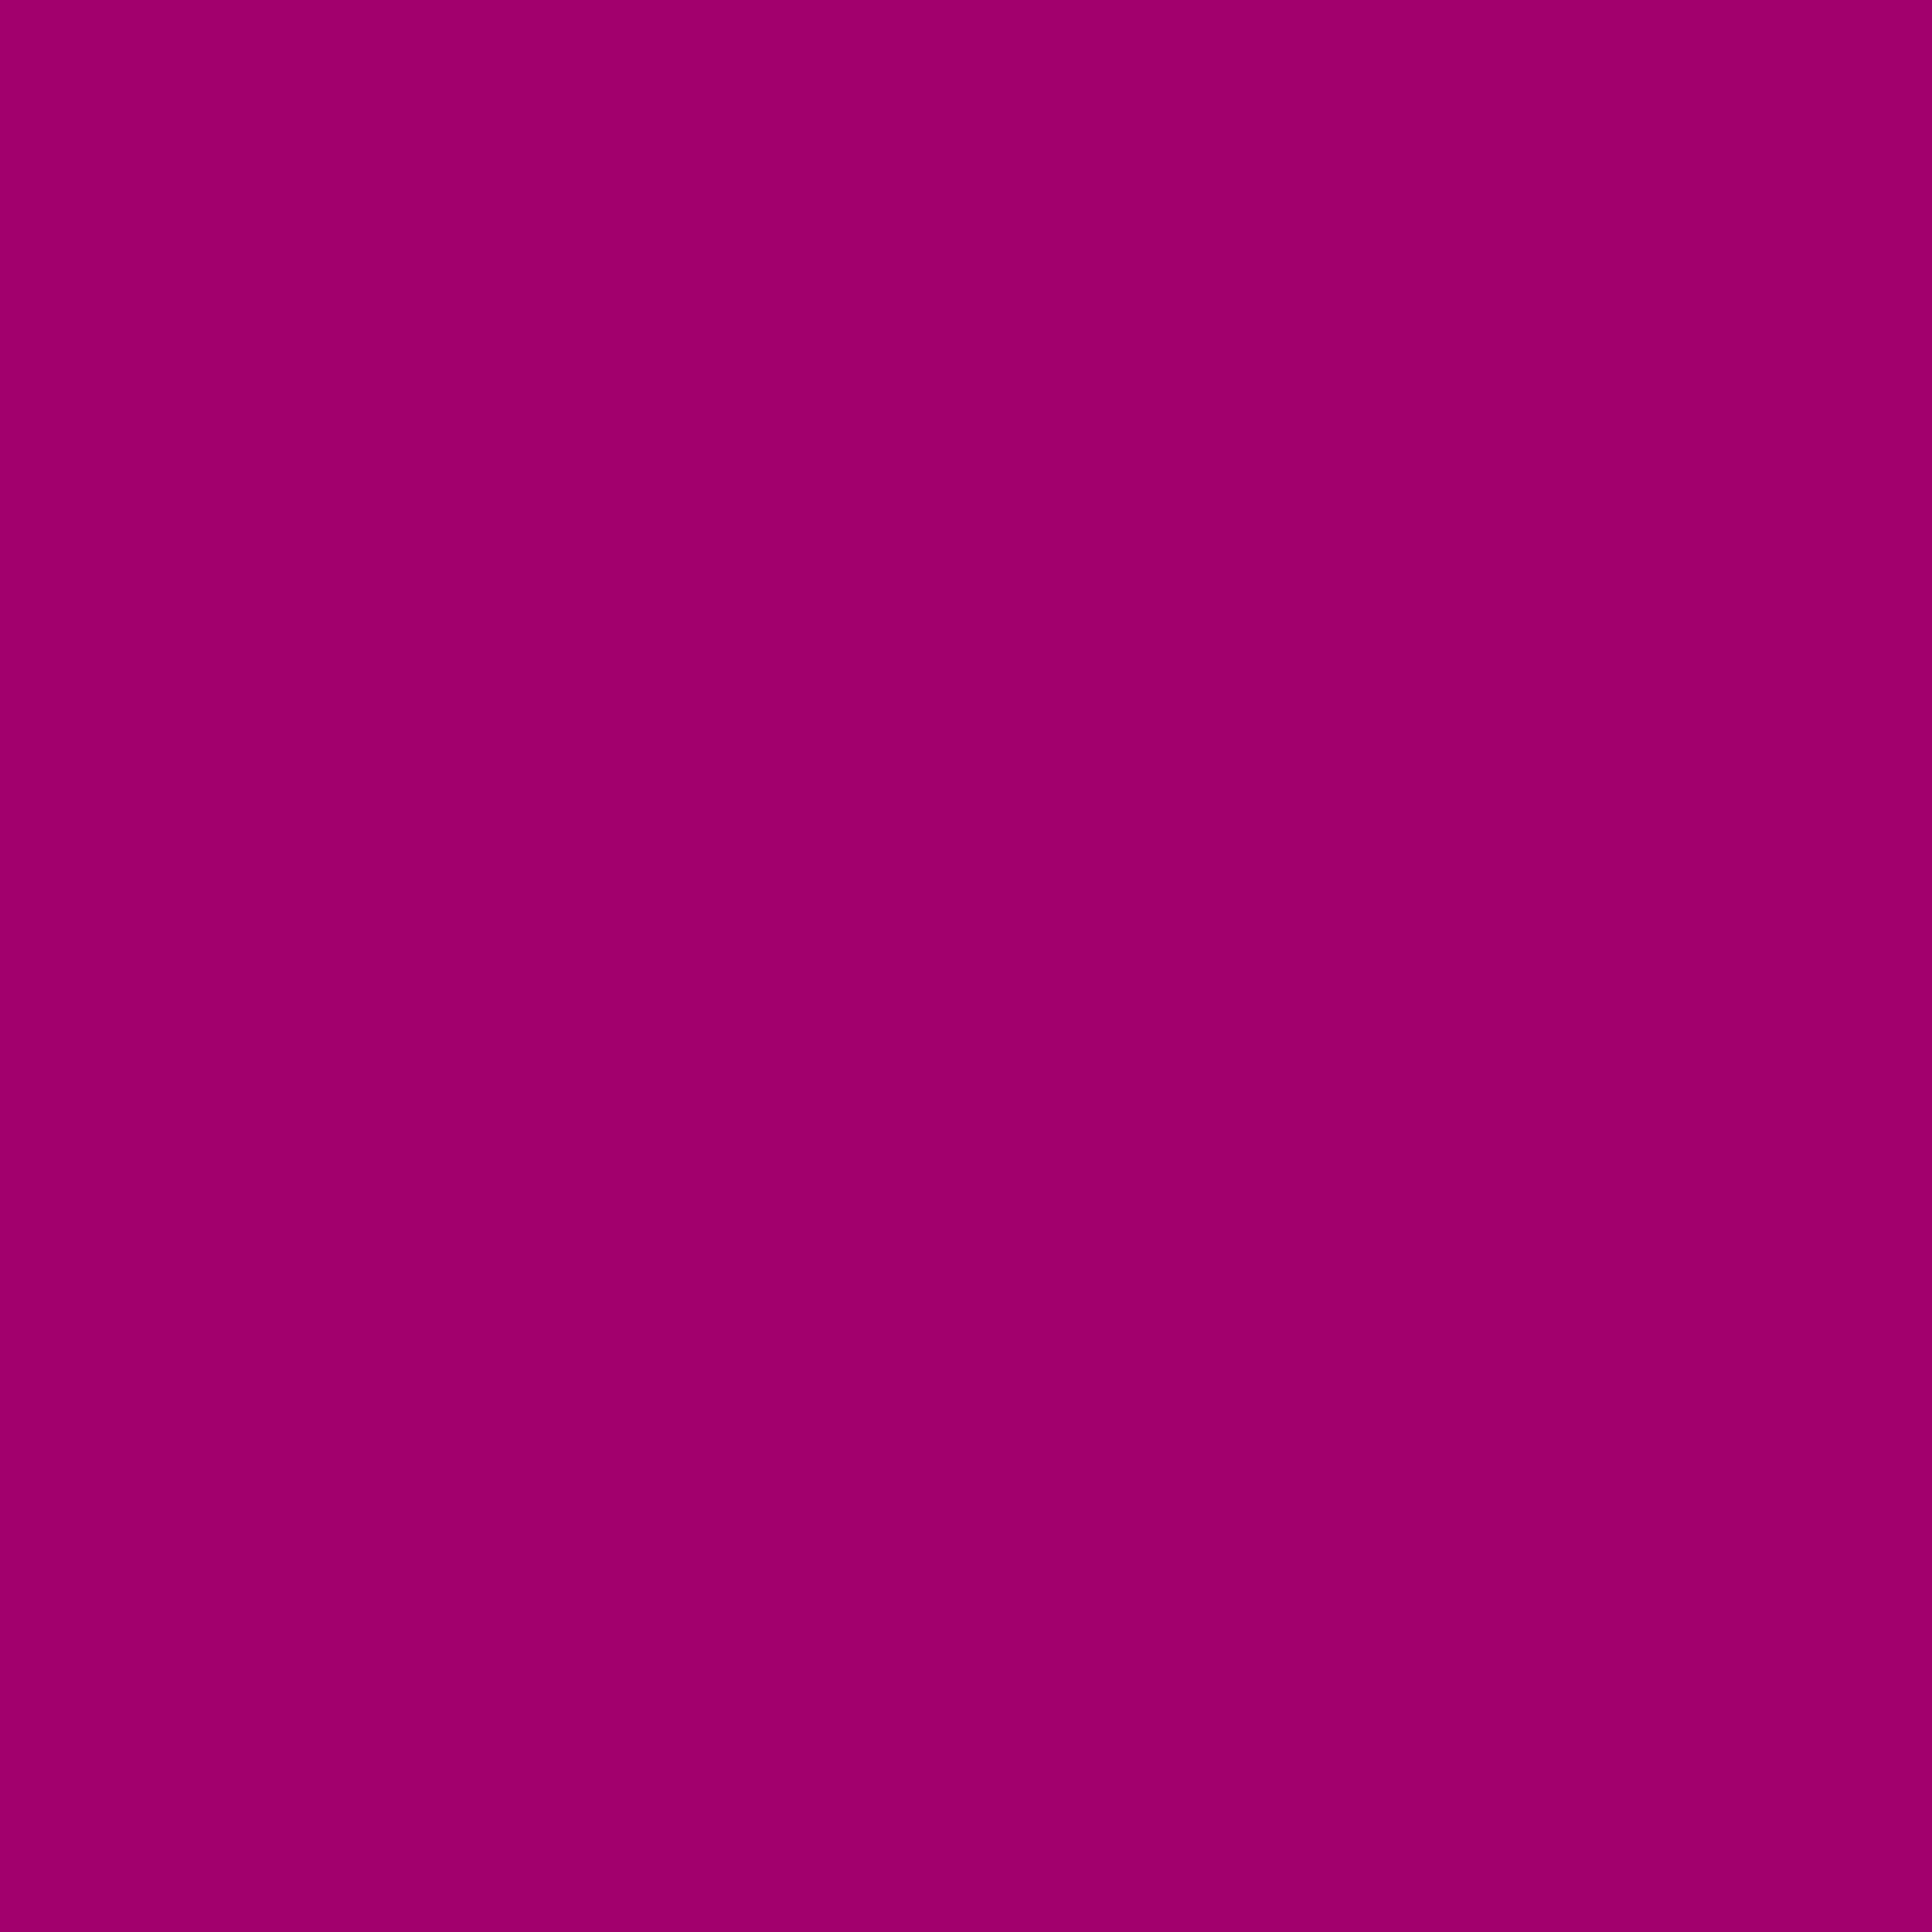 3600x3600 Flirt Solid Color Background